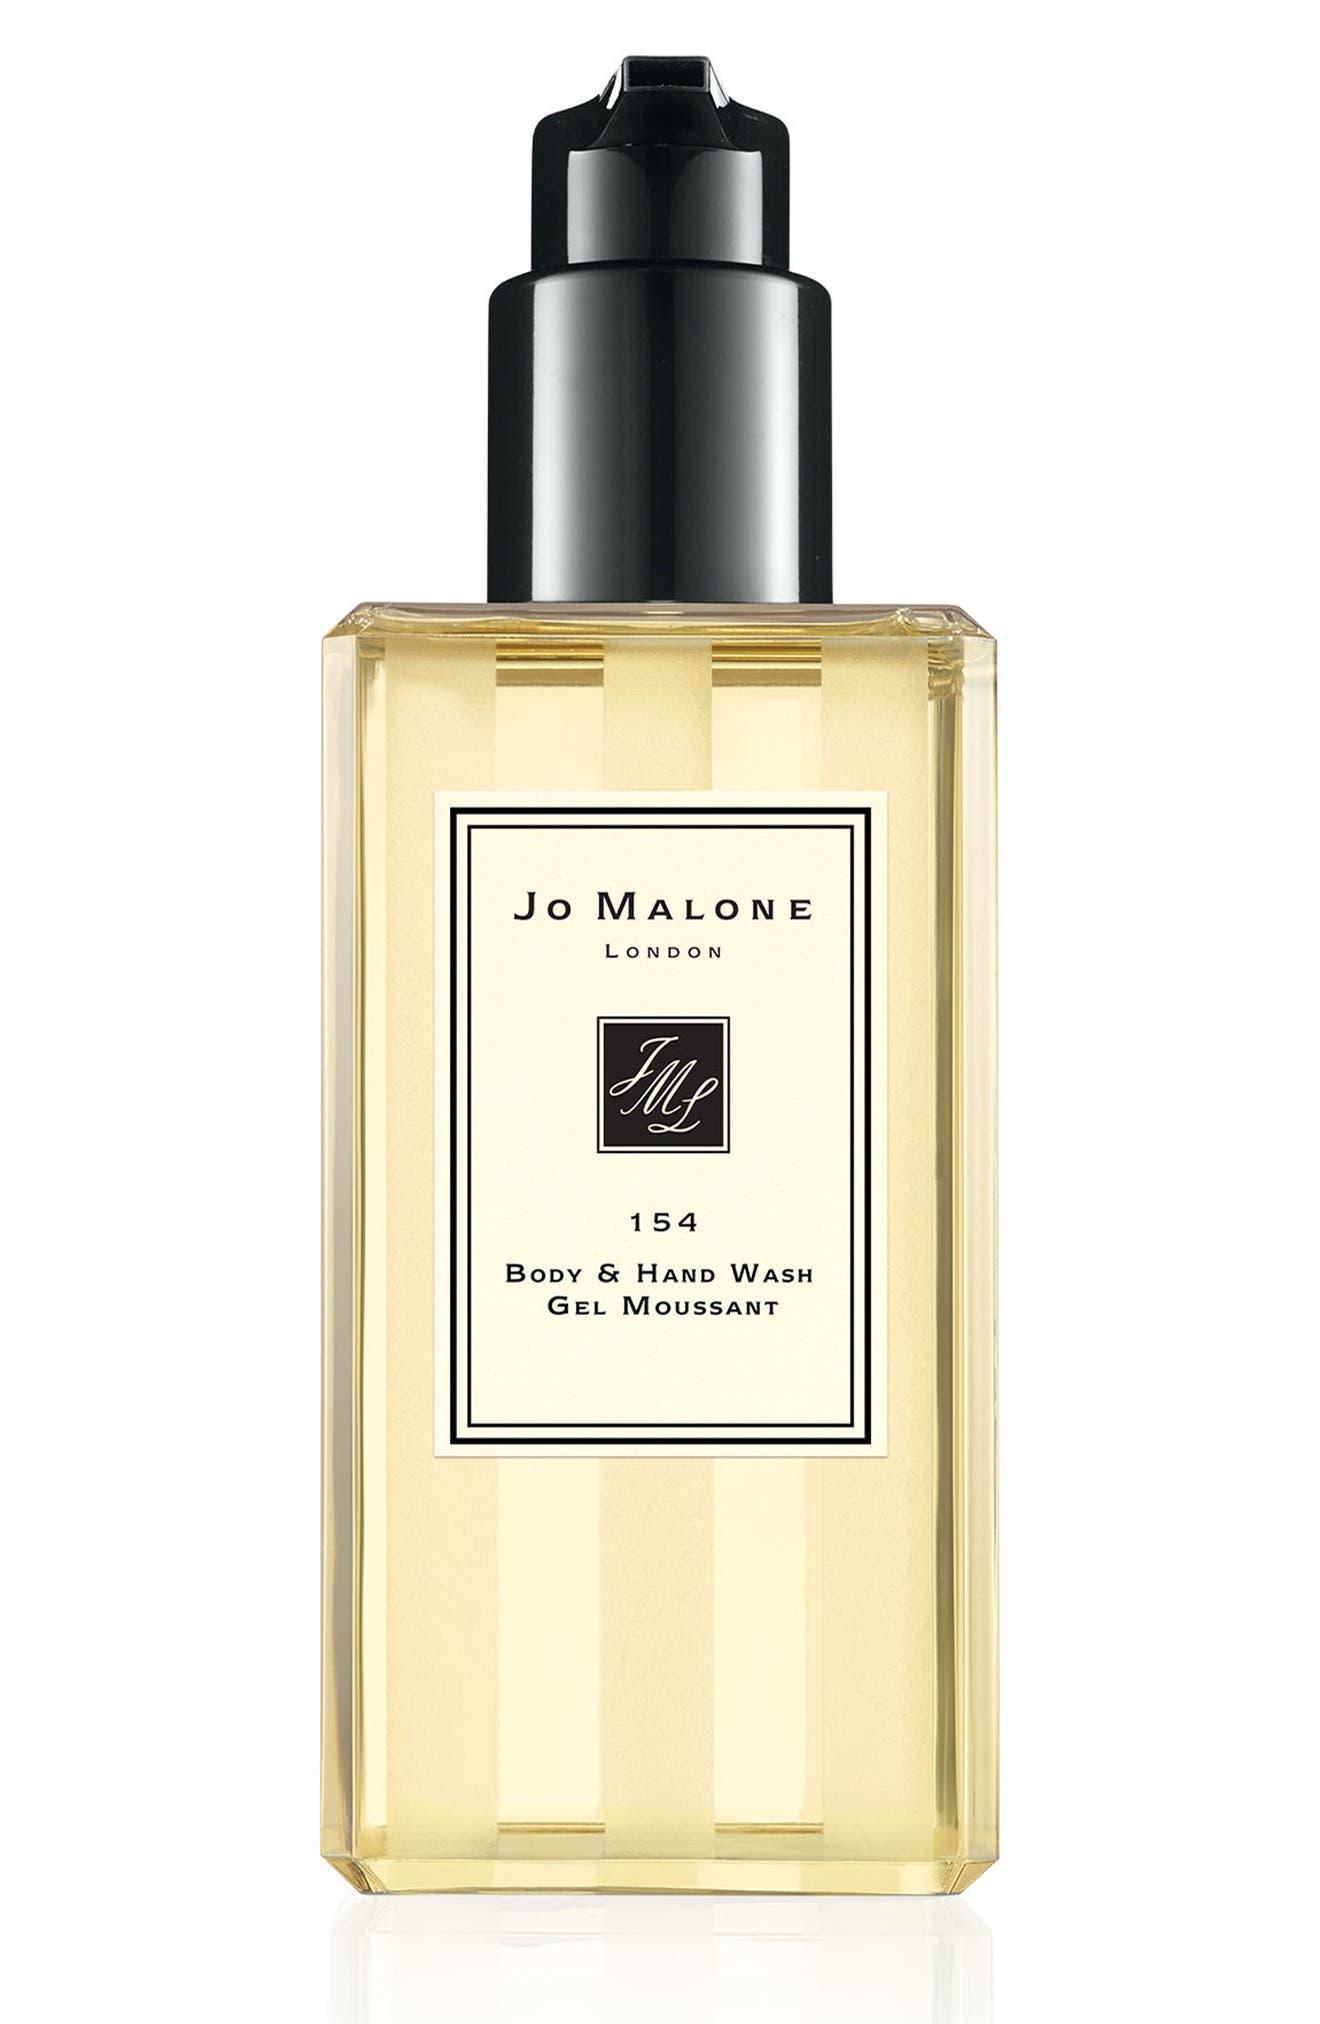 Jo Malone London™ '154' Body & Hand Wash